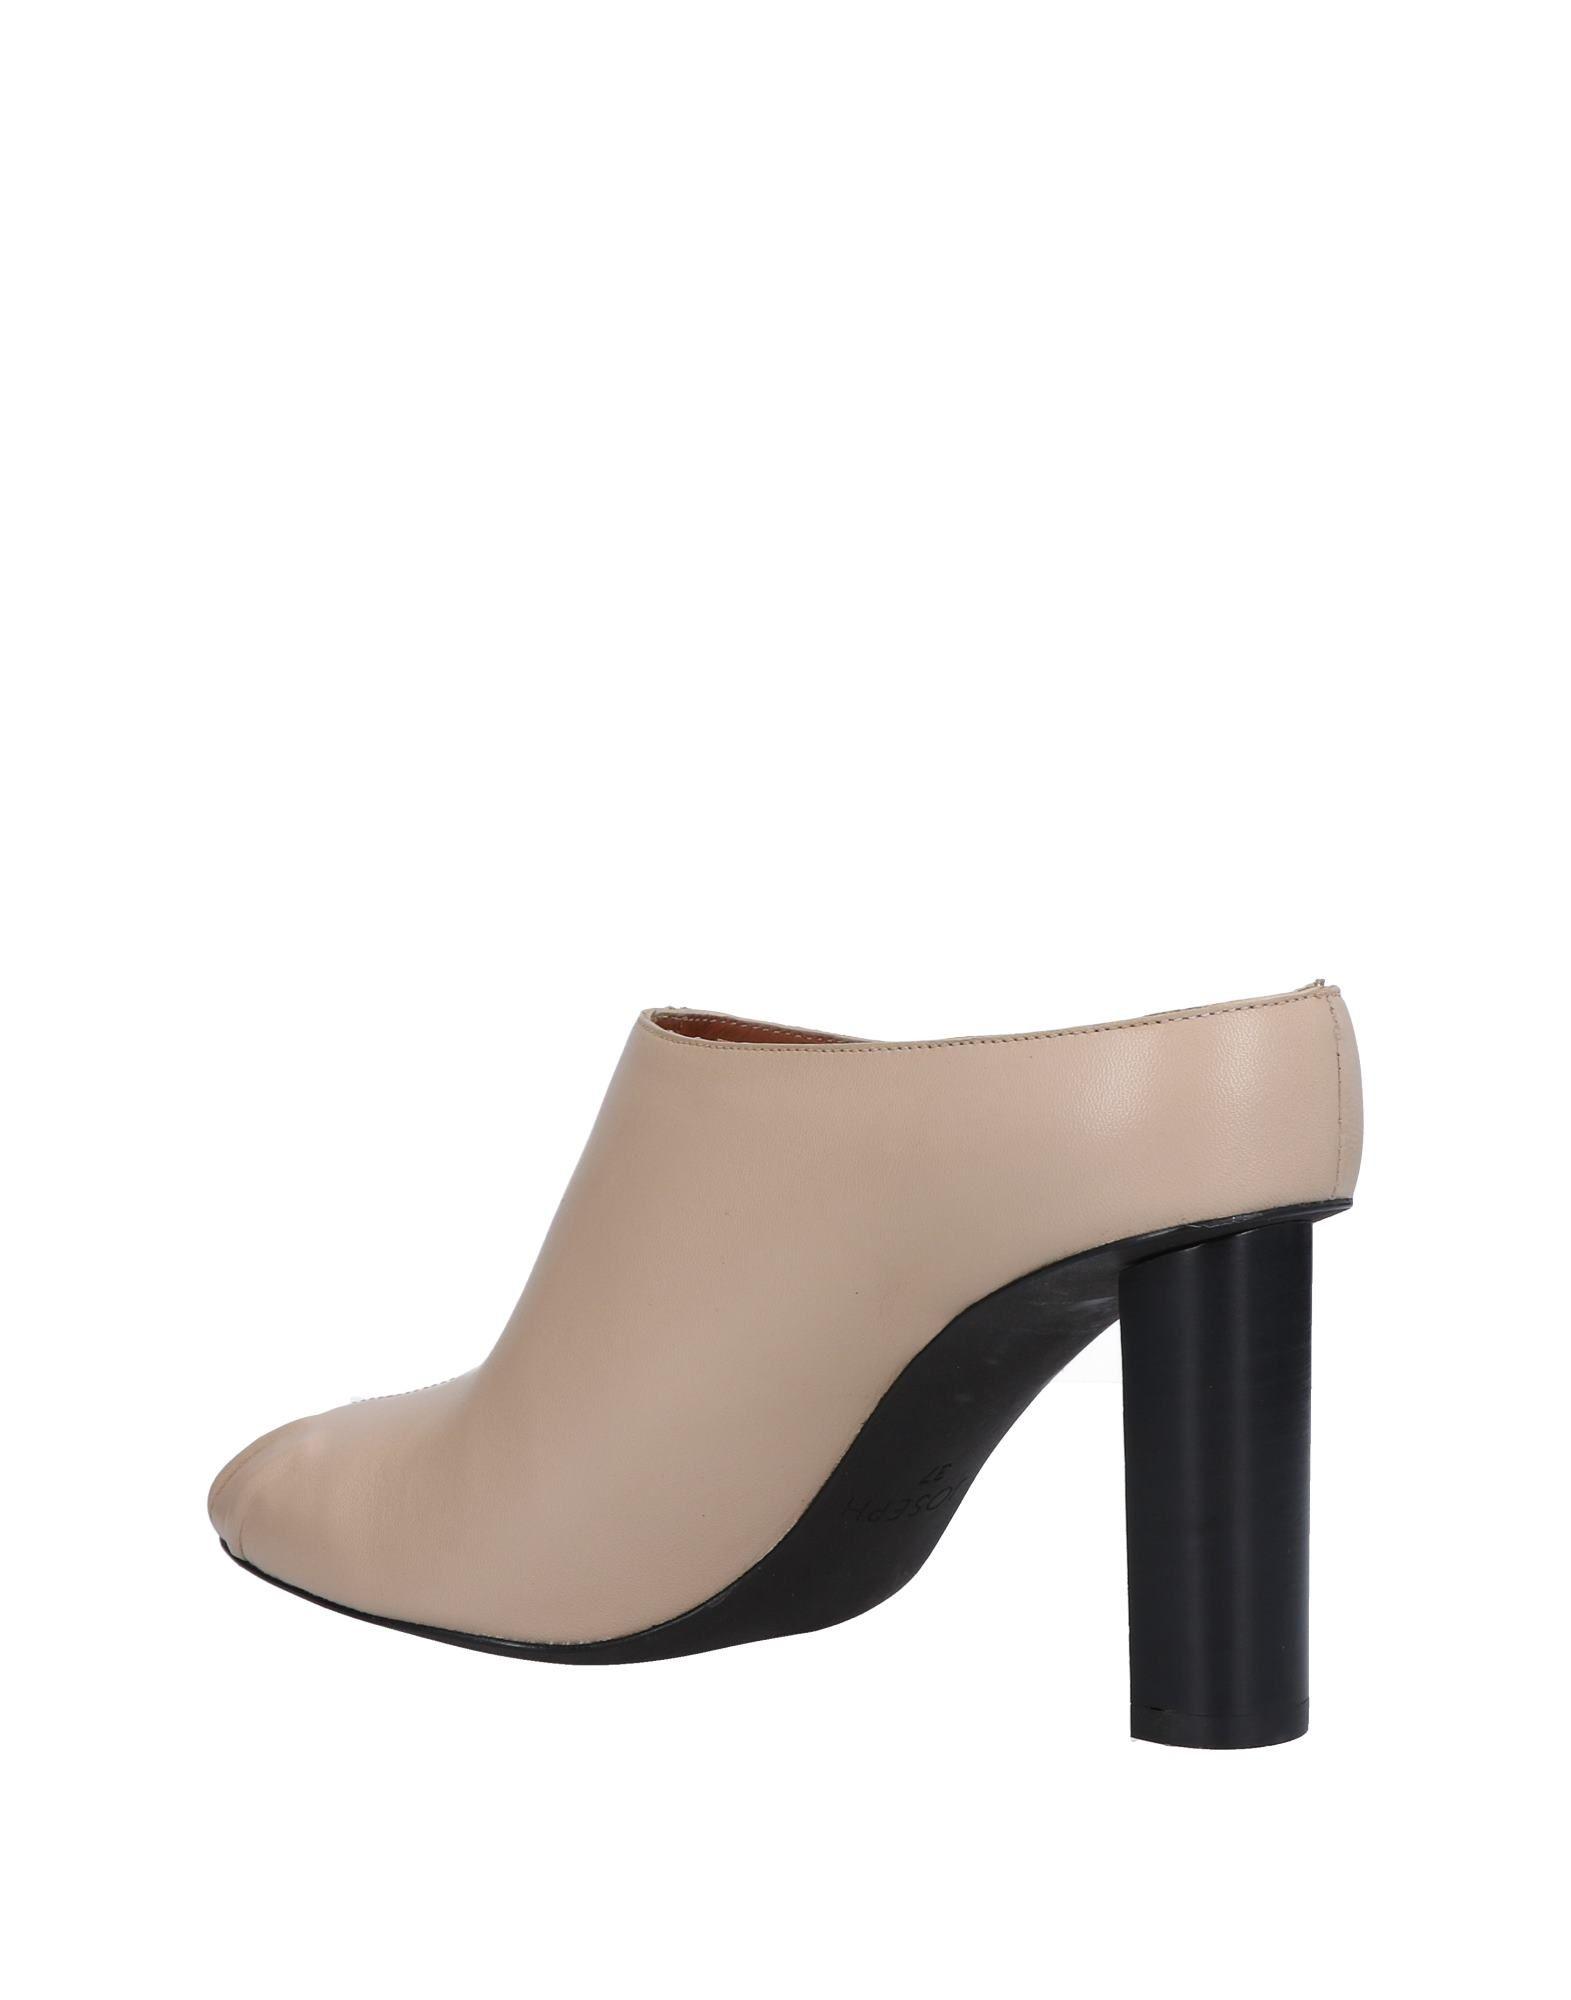 Stilvolle billige Pantoletten Schuhe Joseph Pantoletten billige Damen  11481017DP 159992